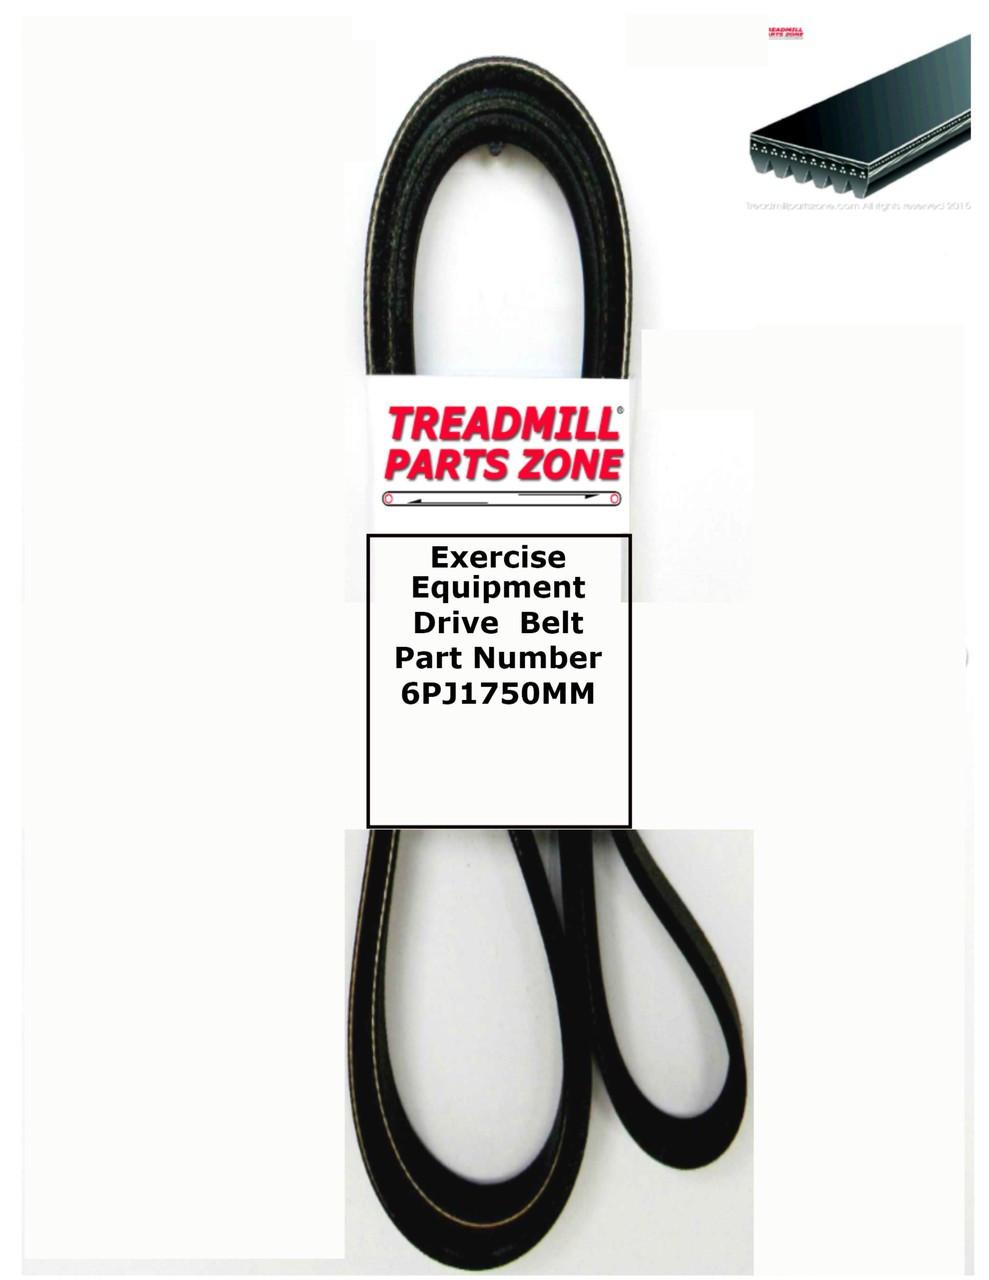 Exercise Equipment Drive  Belt Part Number 6PJ1750MM